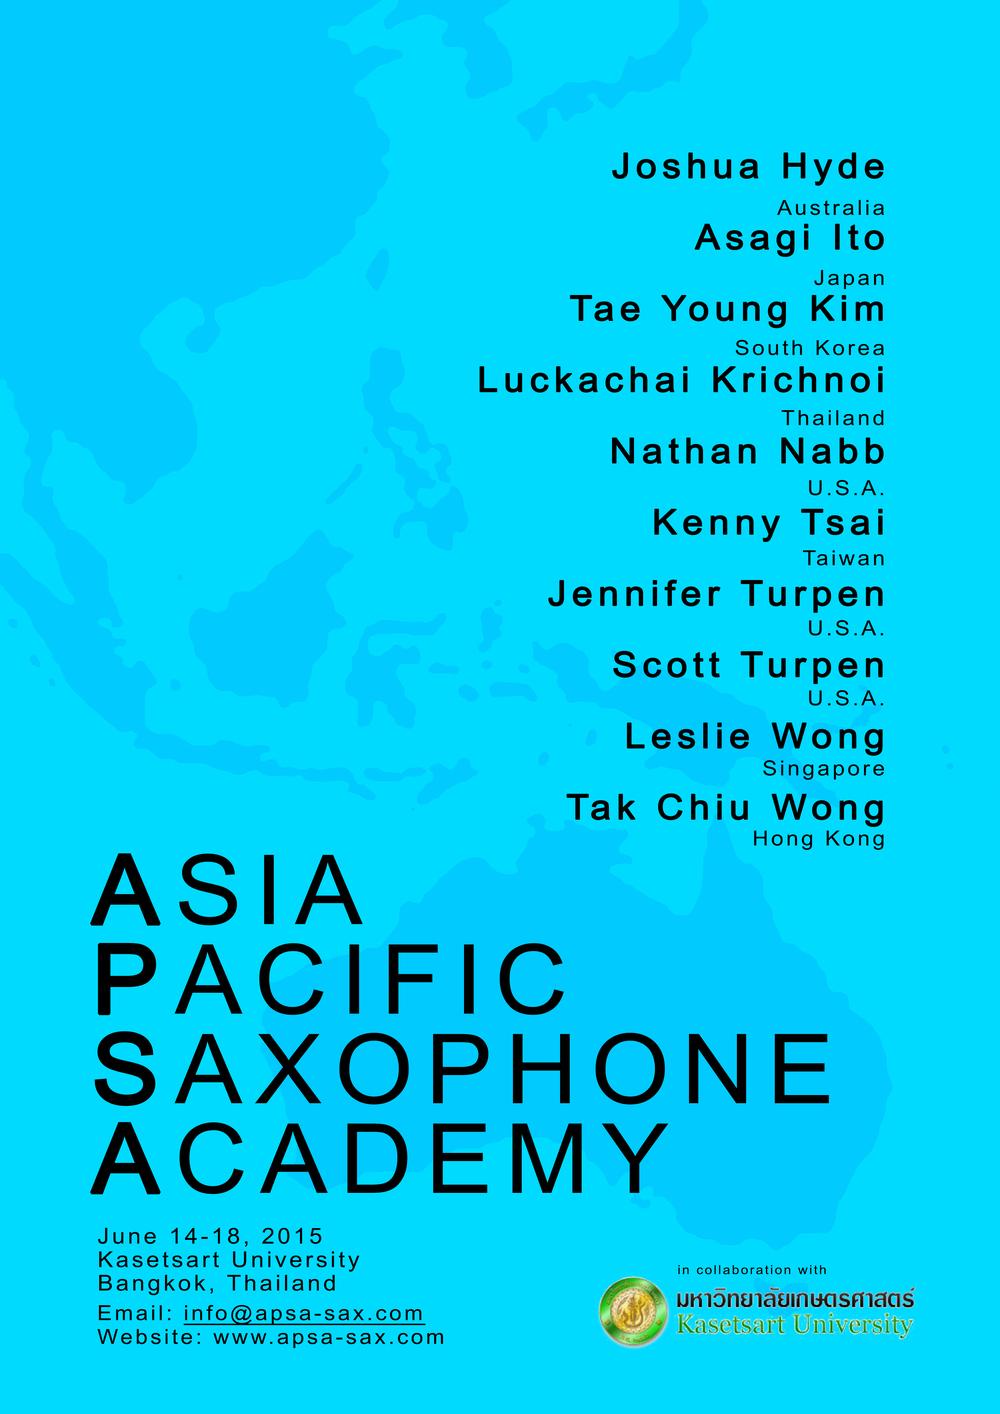 ASPA2015 APSA Poster (English).jpg